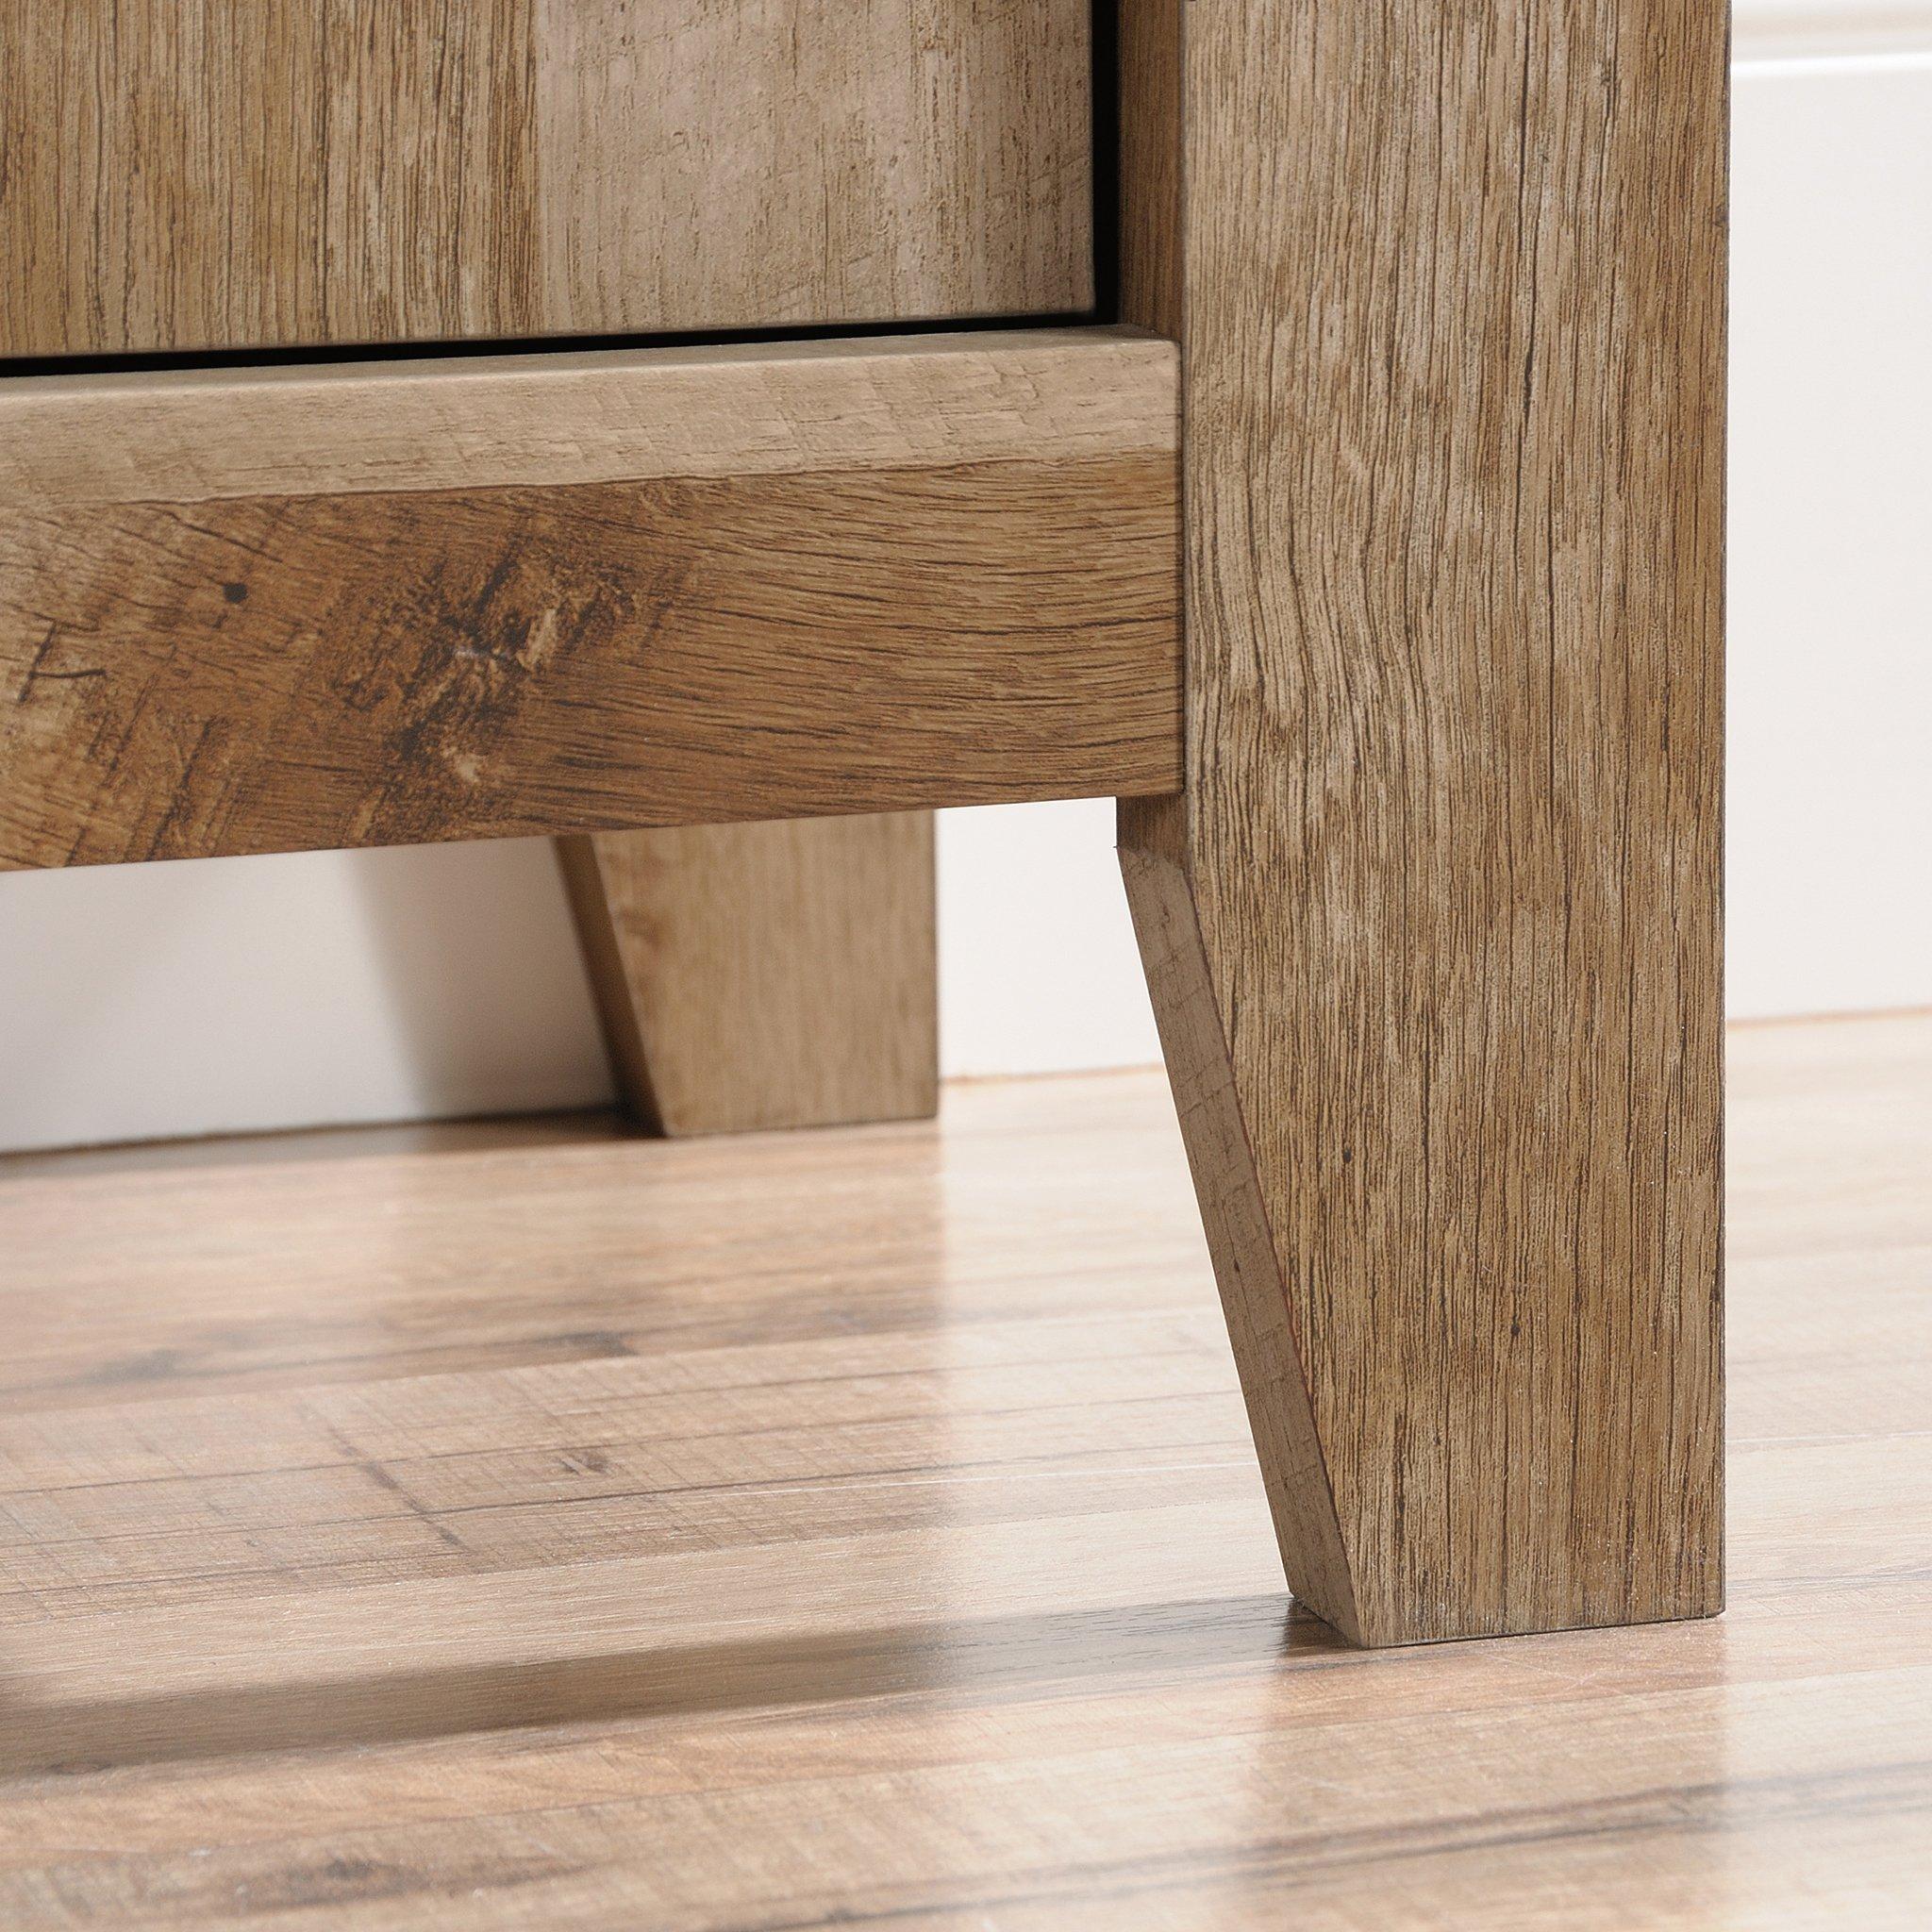 Sauder 420409 Dakota Pass Library with Doors, L: 33.82'' x W: 12.52'' x H: 71.10'', Craftsman Oak Finish by Sauder (Image #6)